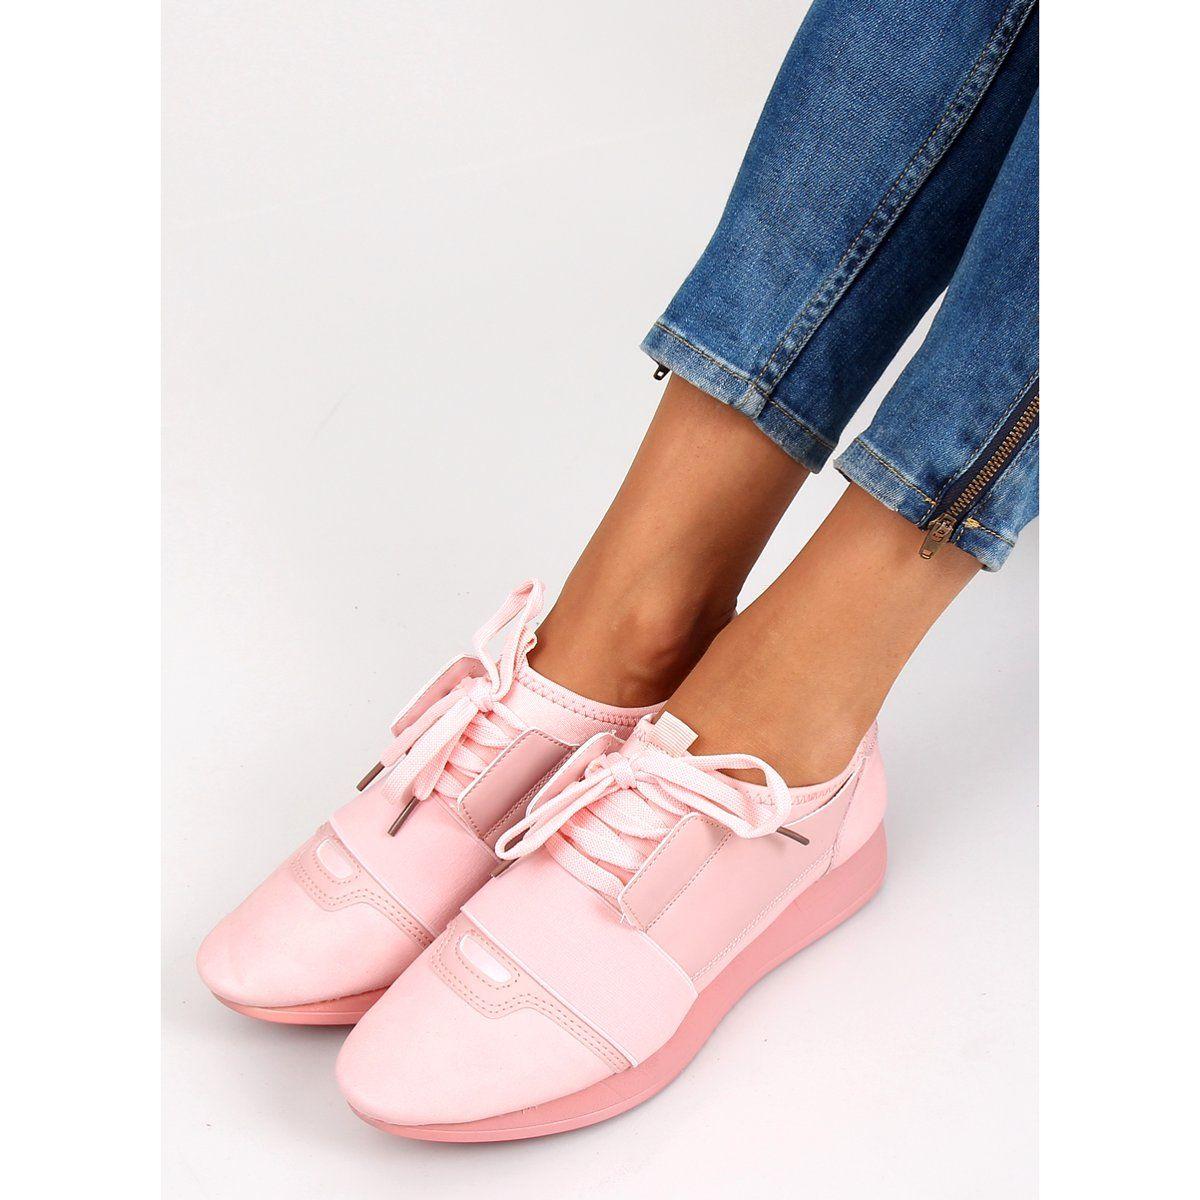 Buty Sportowe Dla Kobiet Ab 170 Pink Rozowe Pink Sport Shoes Women Shoes Shoes